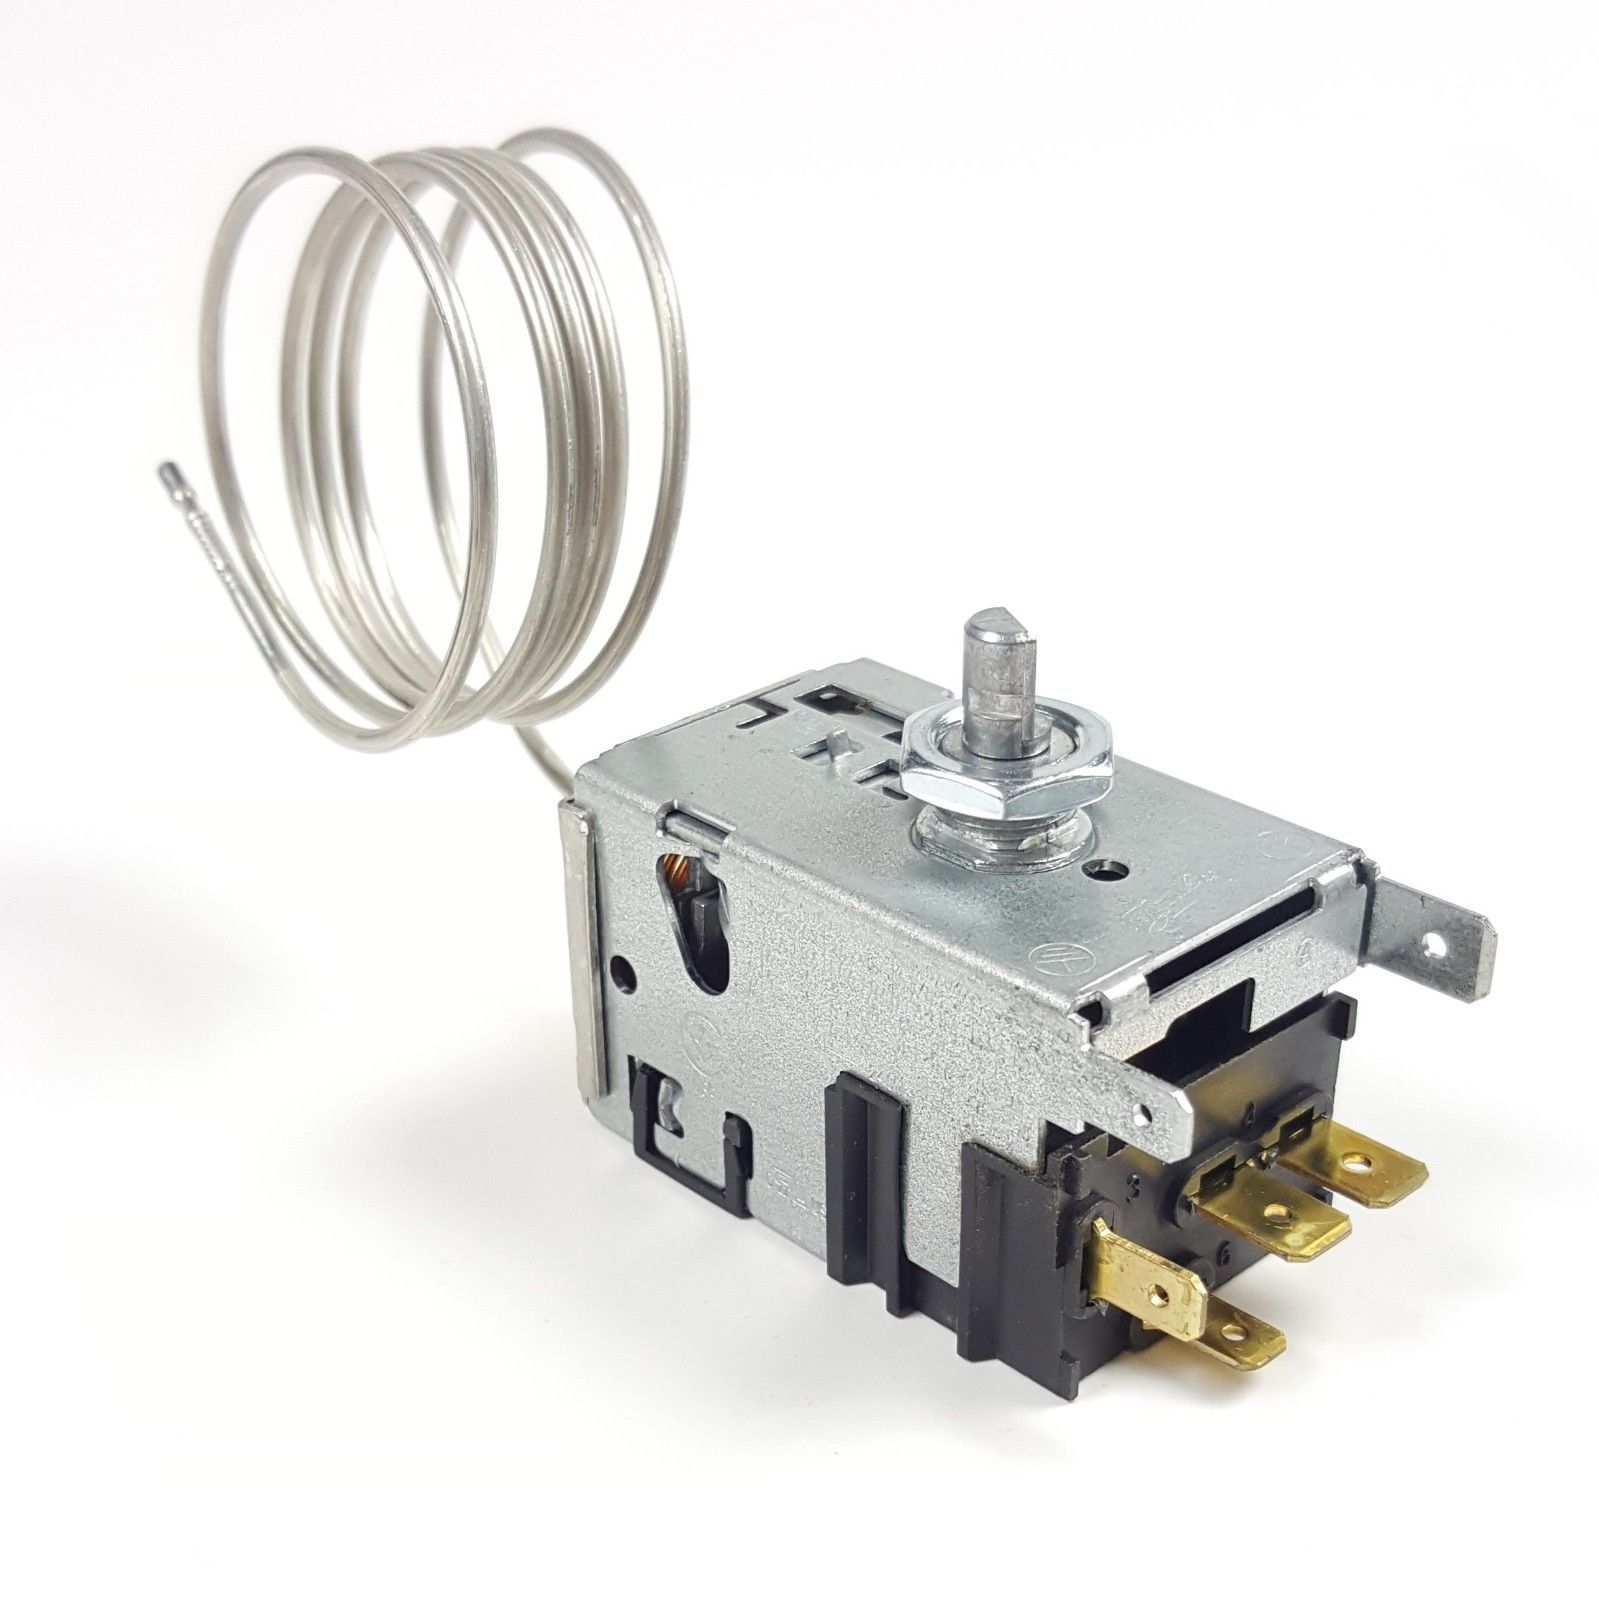 termostat do chladničky Bosch Siemens - 00607862 Bosch / Siemens